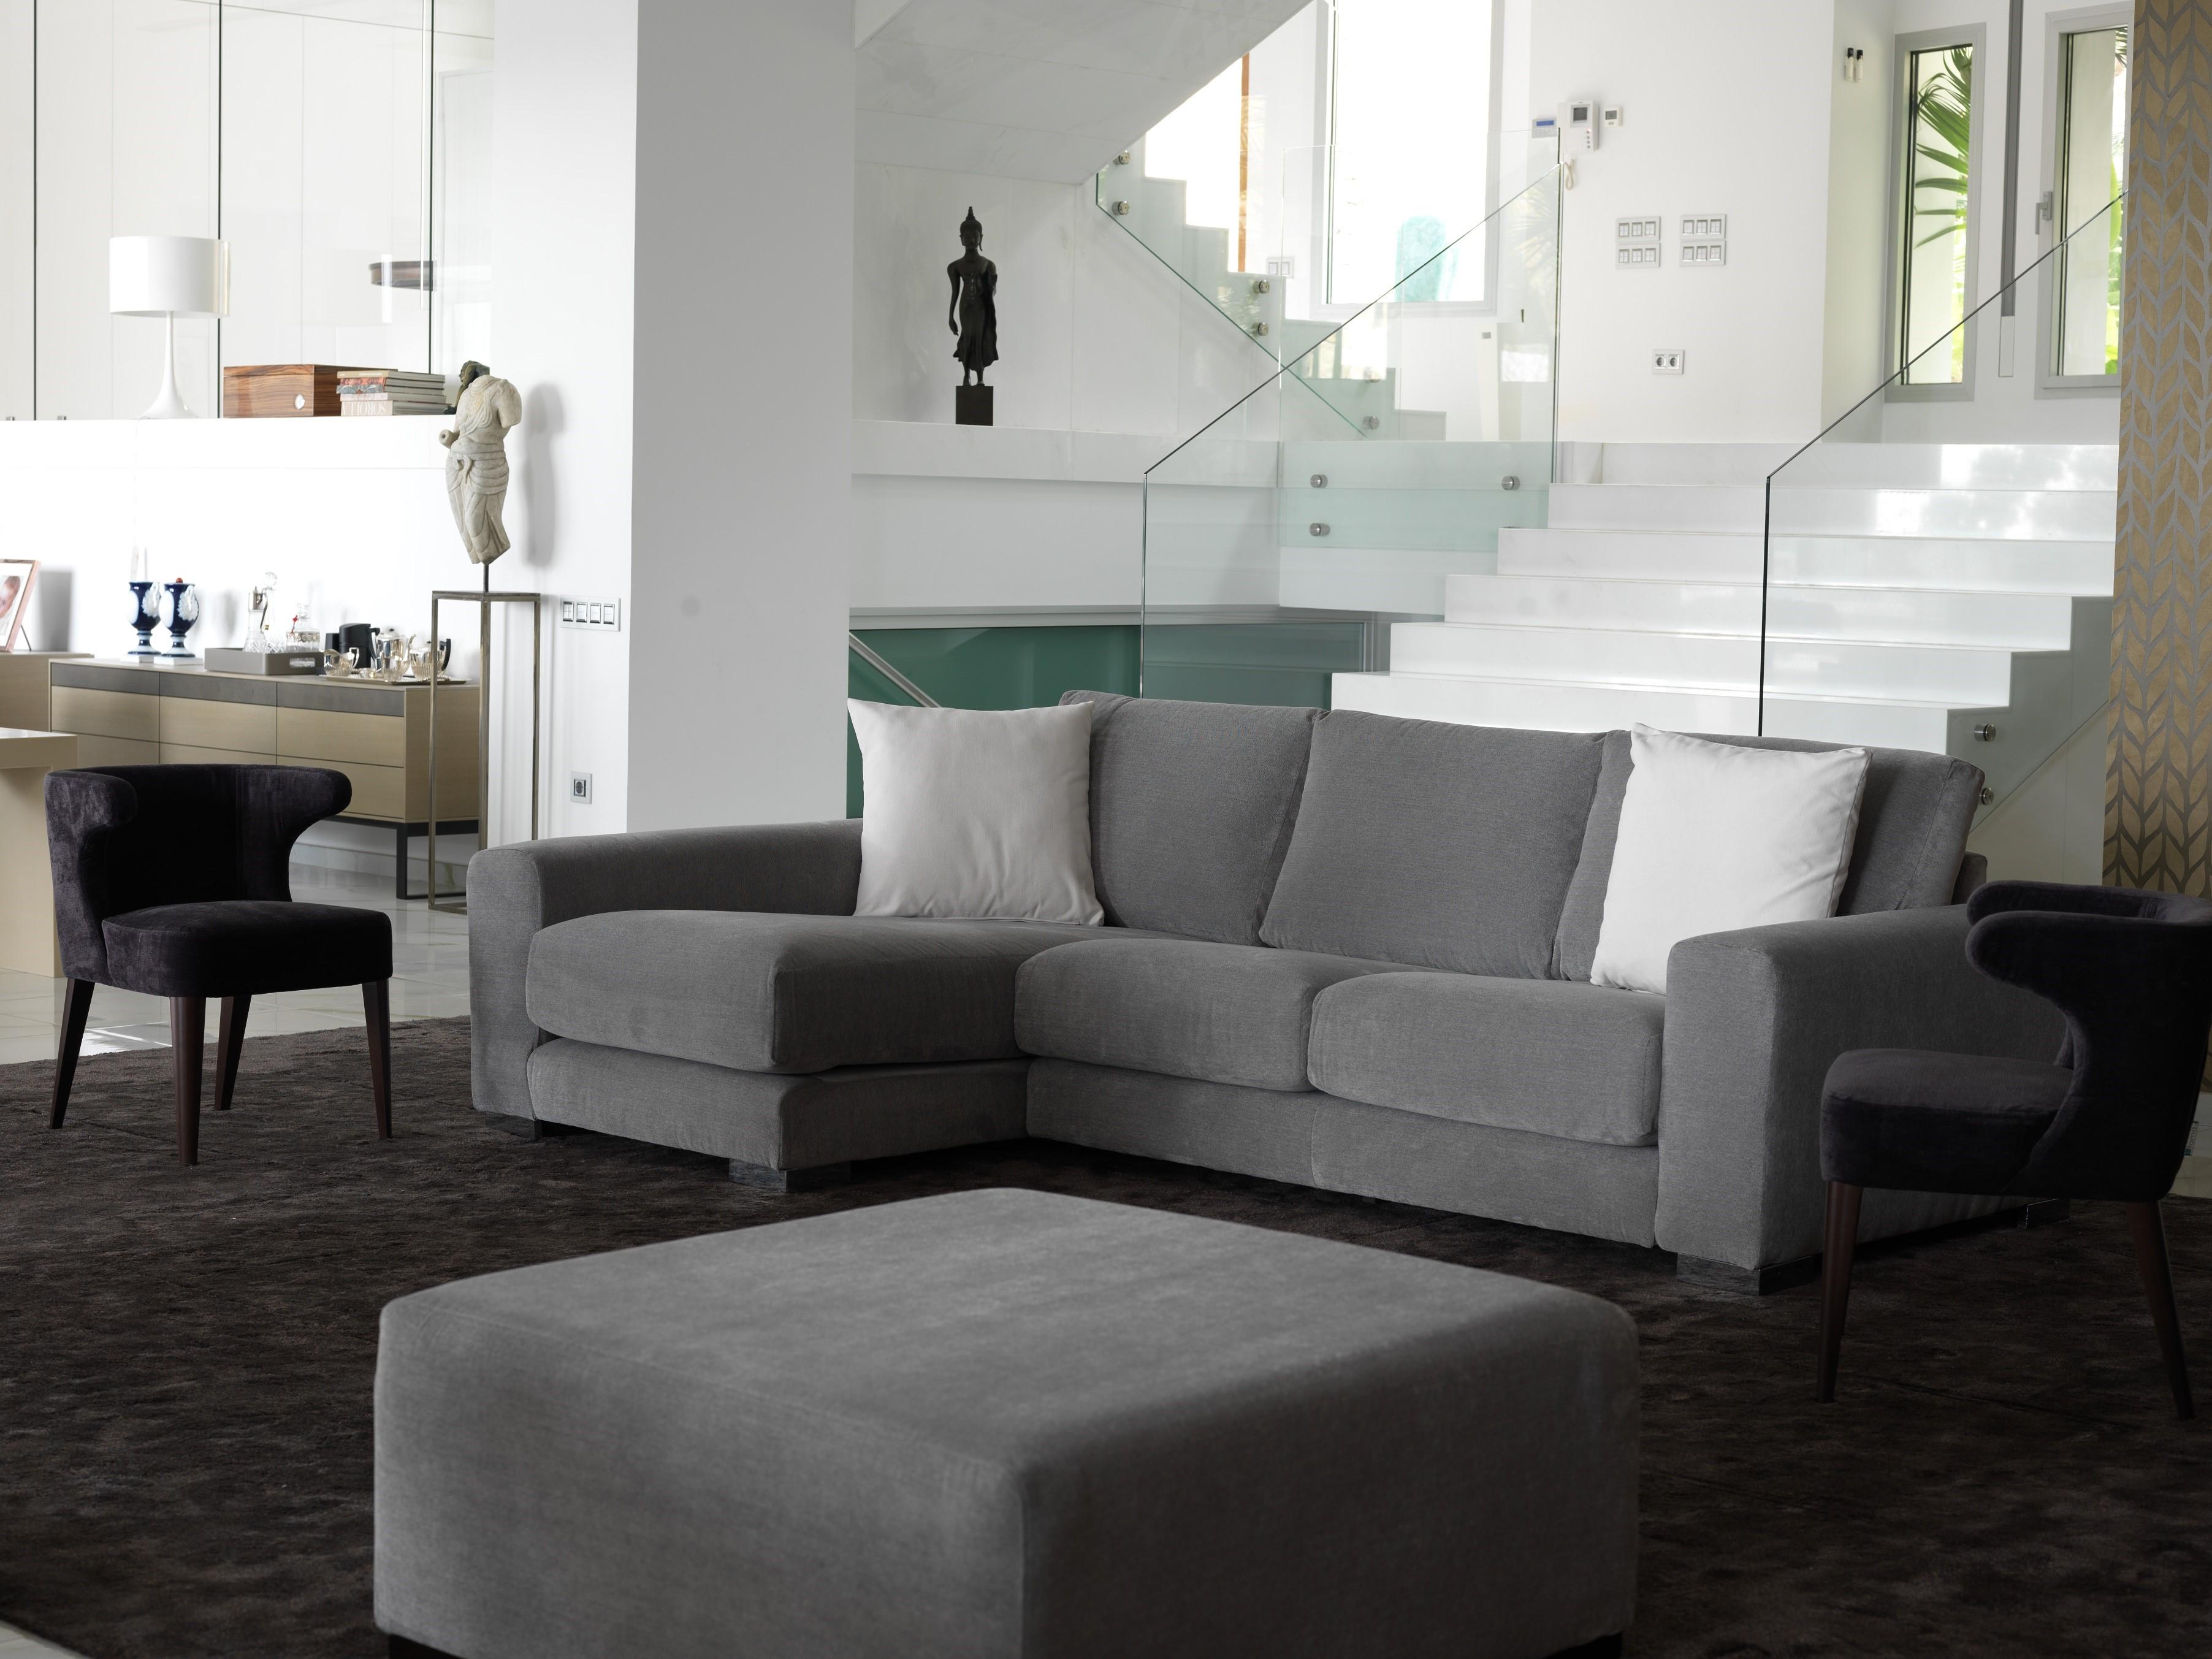 Sof comprar sof decoraci n sof s - Decoracion salon grande ...